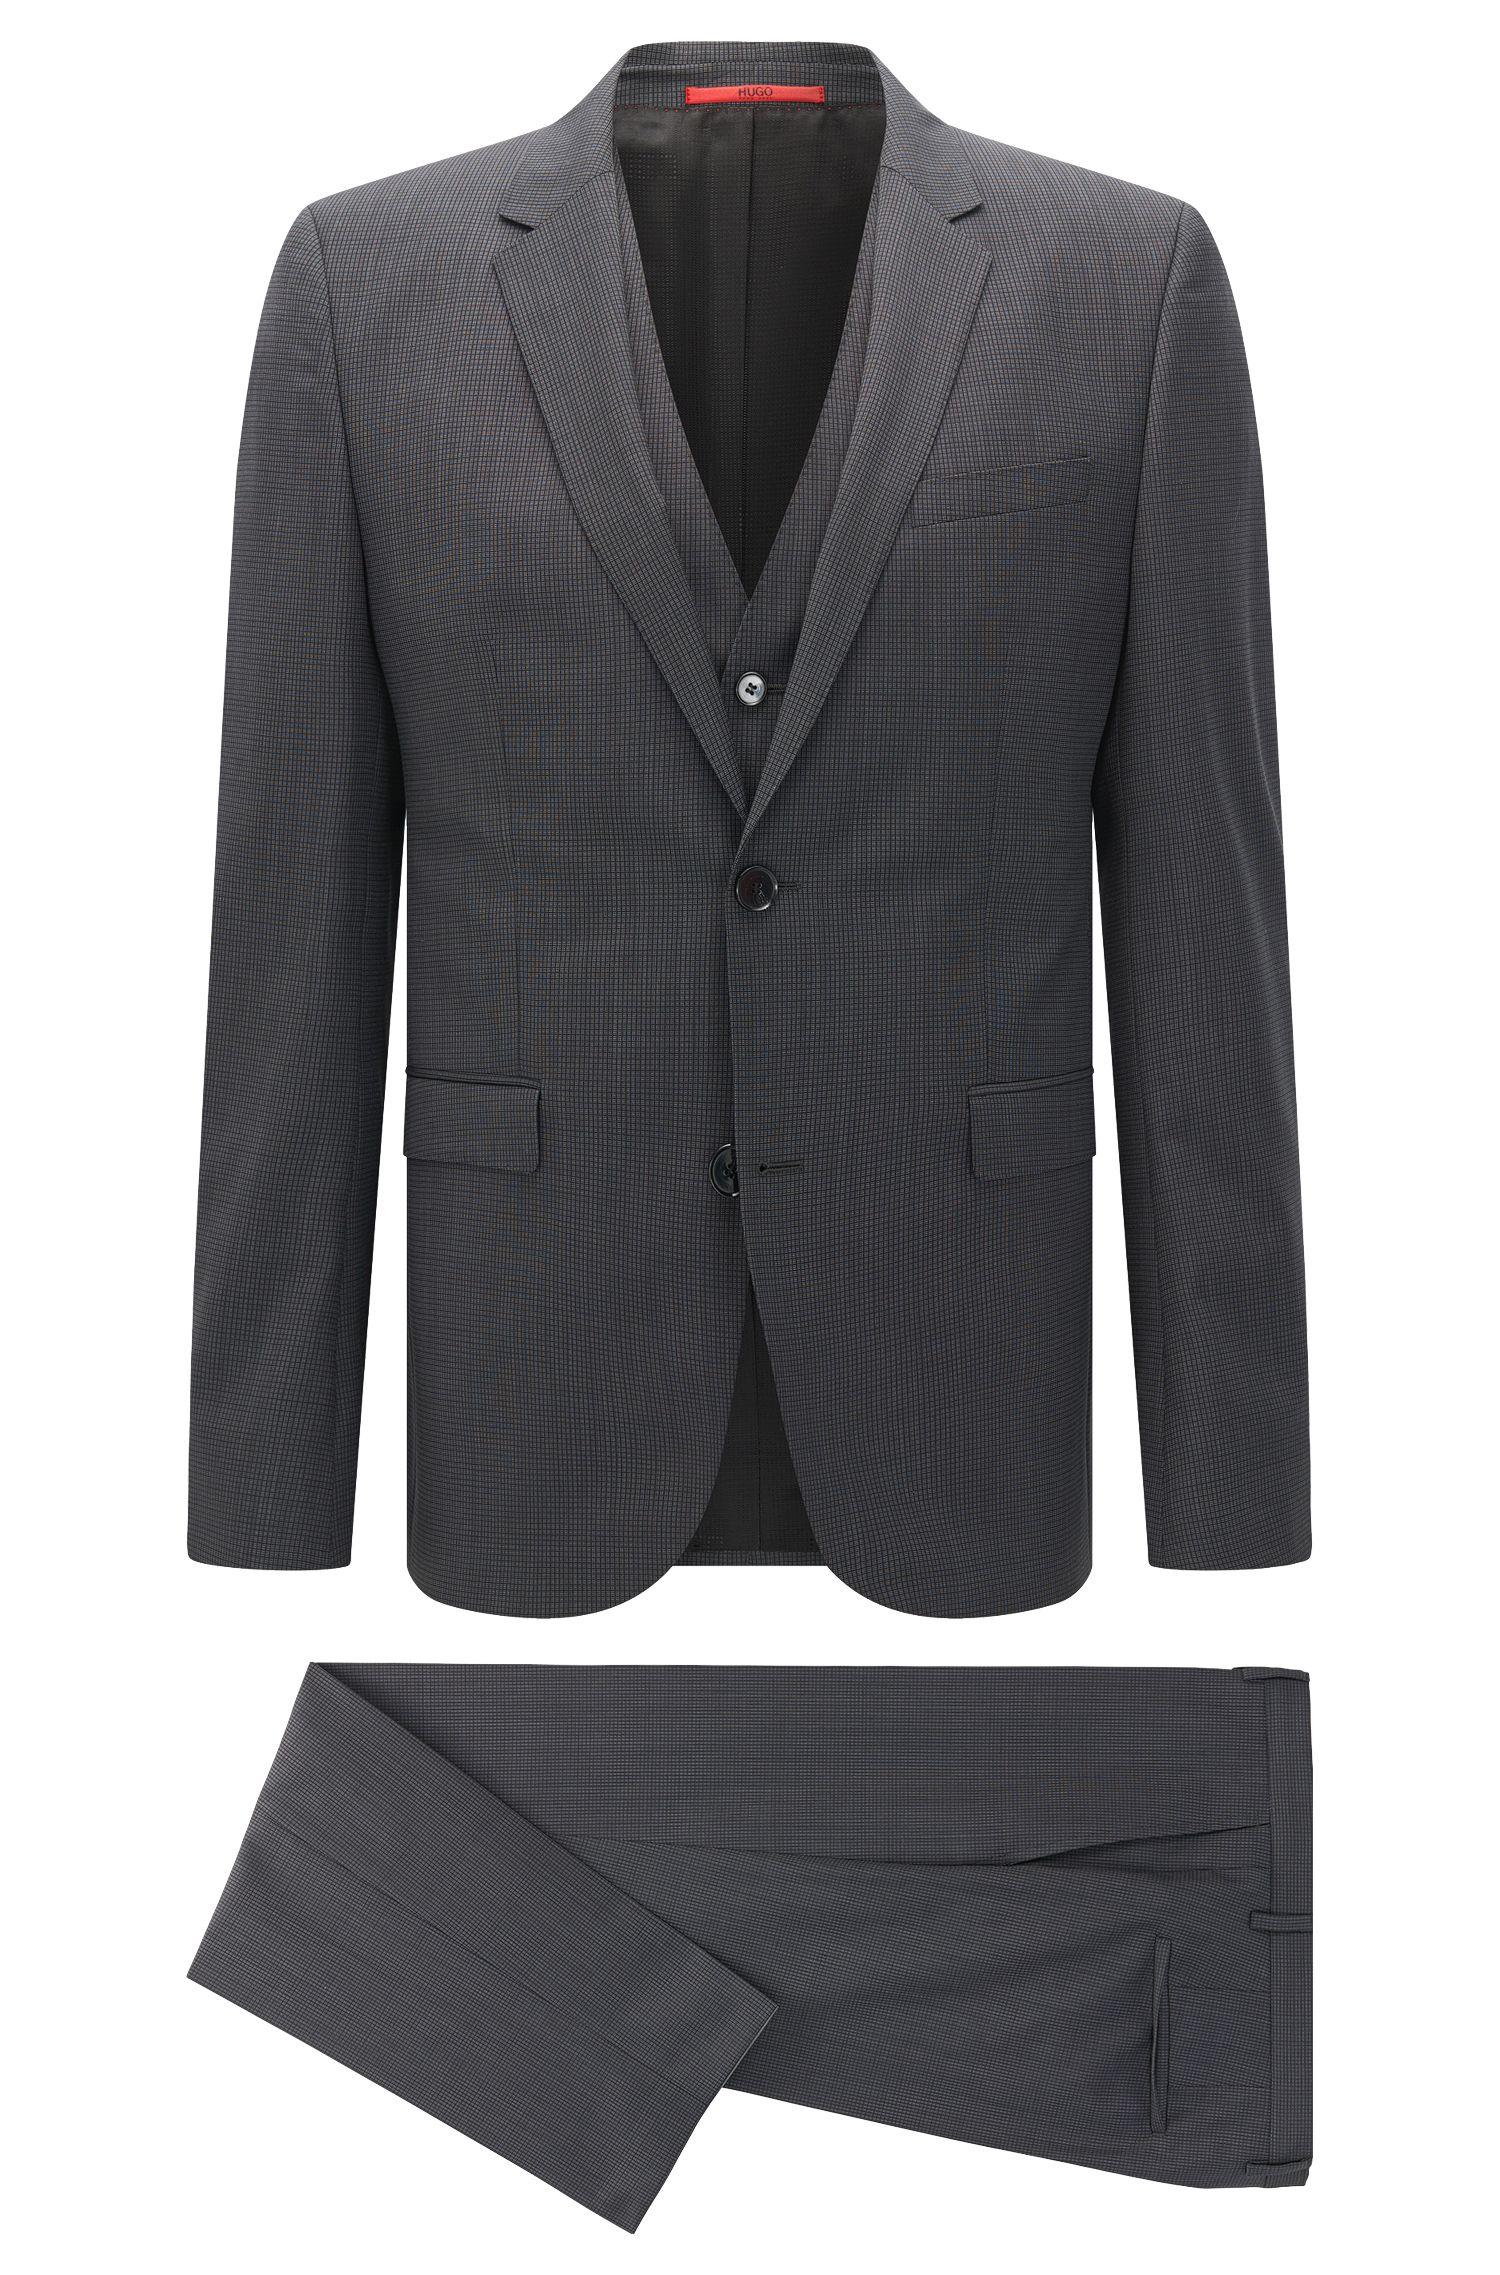 Checked Italian Super 120 Virgin Wool 3-Piece Suit, Slim Fit | Adwart/Wilard/Hets